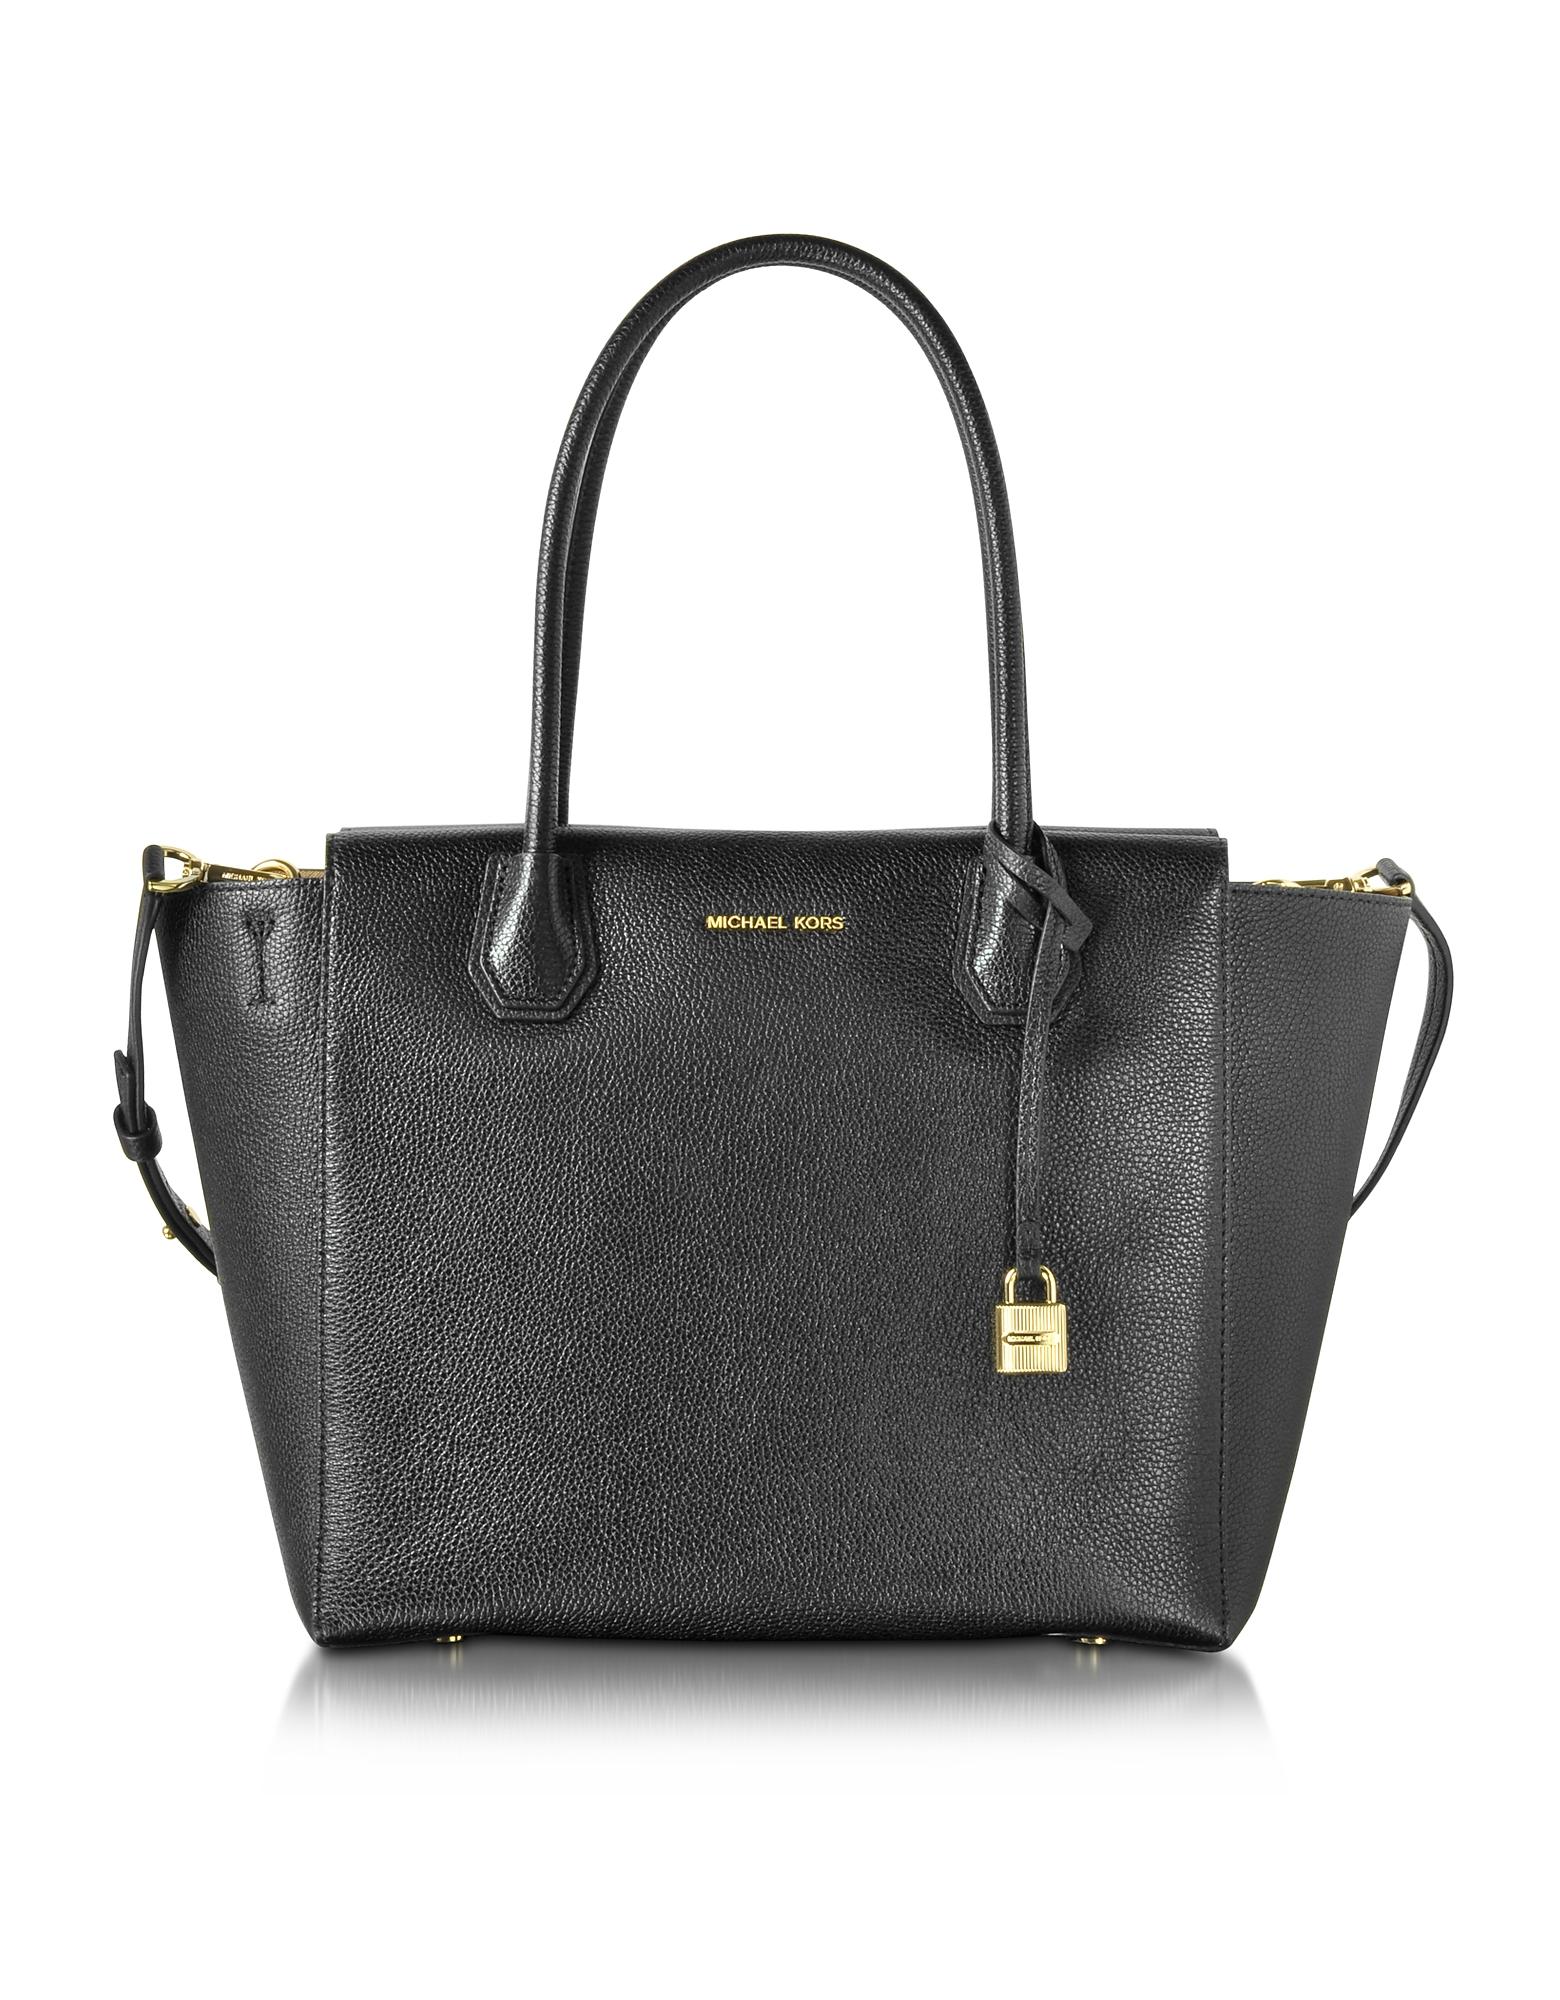 Michael Kors Handbags, Mercer Large Black Bonded Pebble Leather Satchel